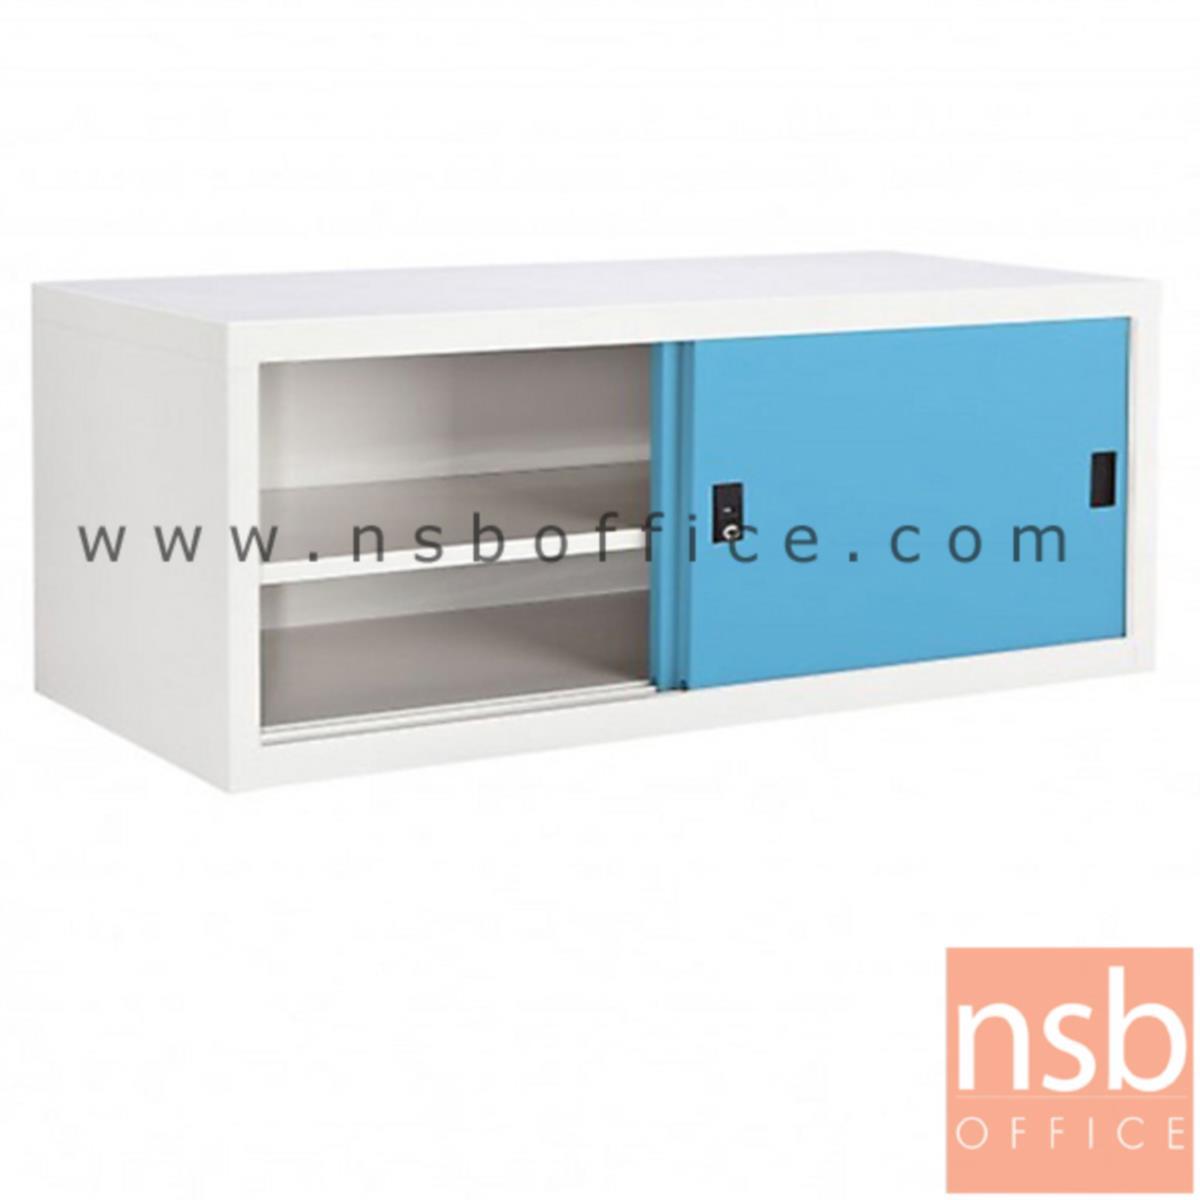 E25A005:ตู้เหล็กบานเลื่อนทึบเตี้ย 3 ฟุต หน้าสีสัน สีขาวครีม 88W*40.7D*44H cm รุ่น USB-1